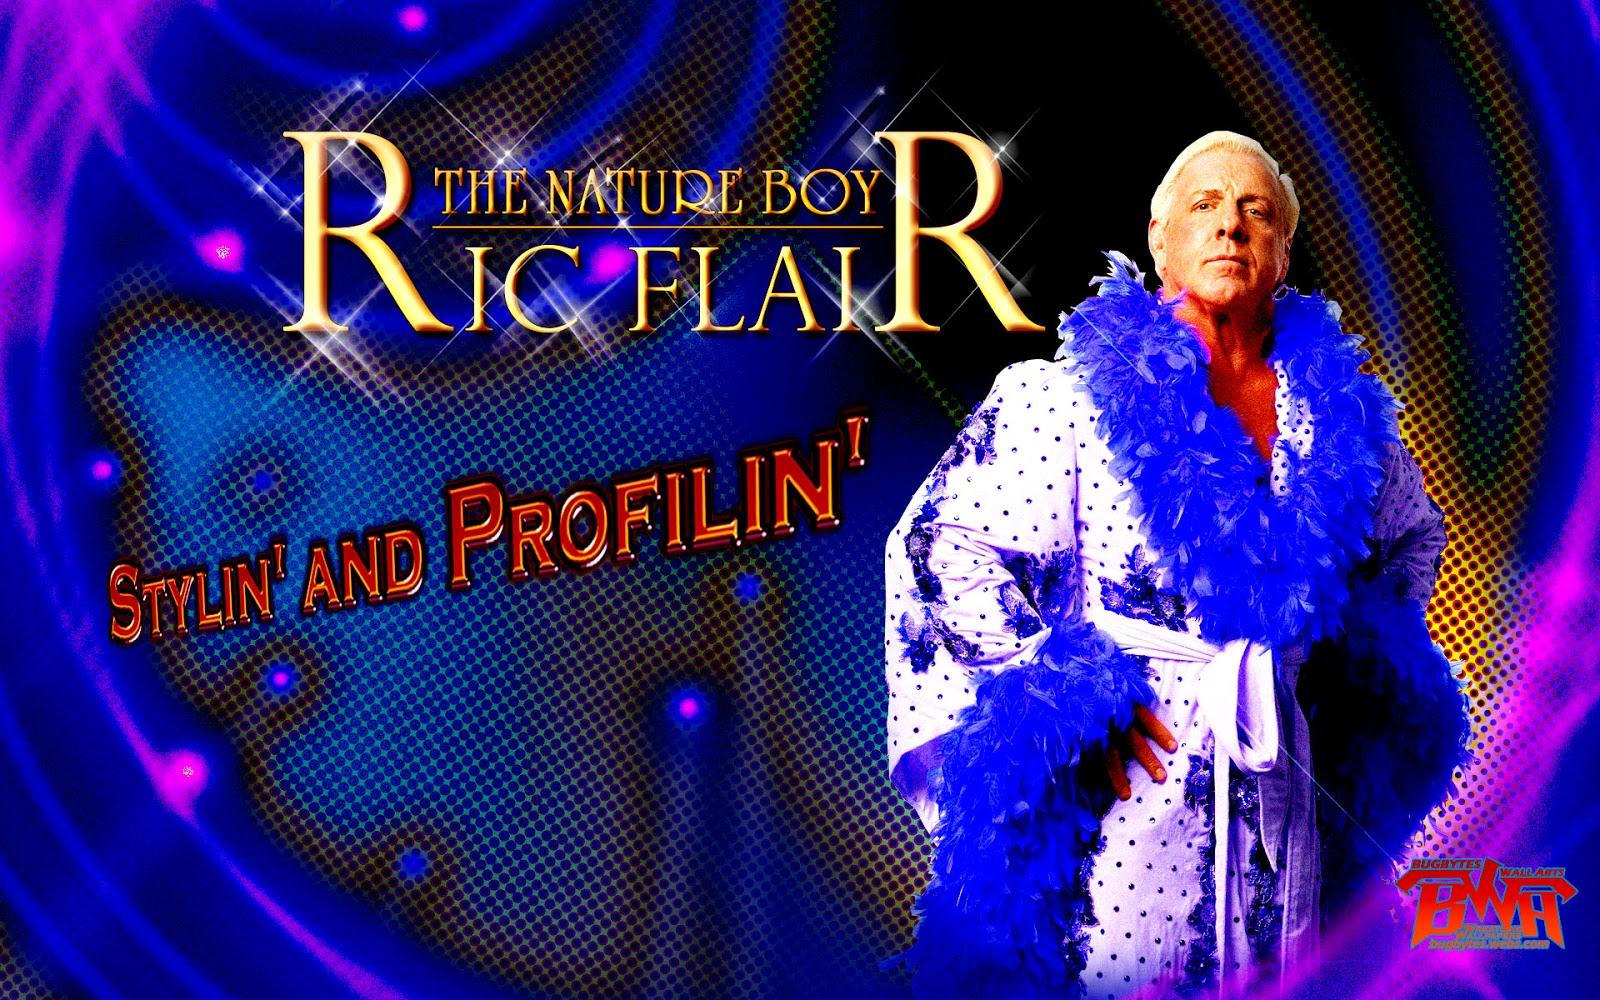 Ric Flair Wallpaper - Ric Flair , HD Wallpaper & Backgrounds